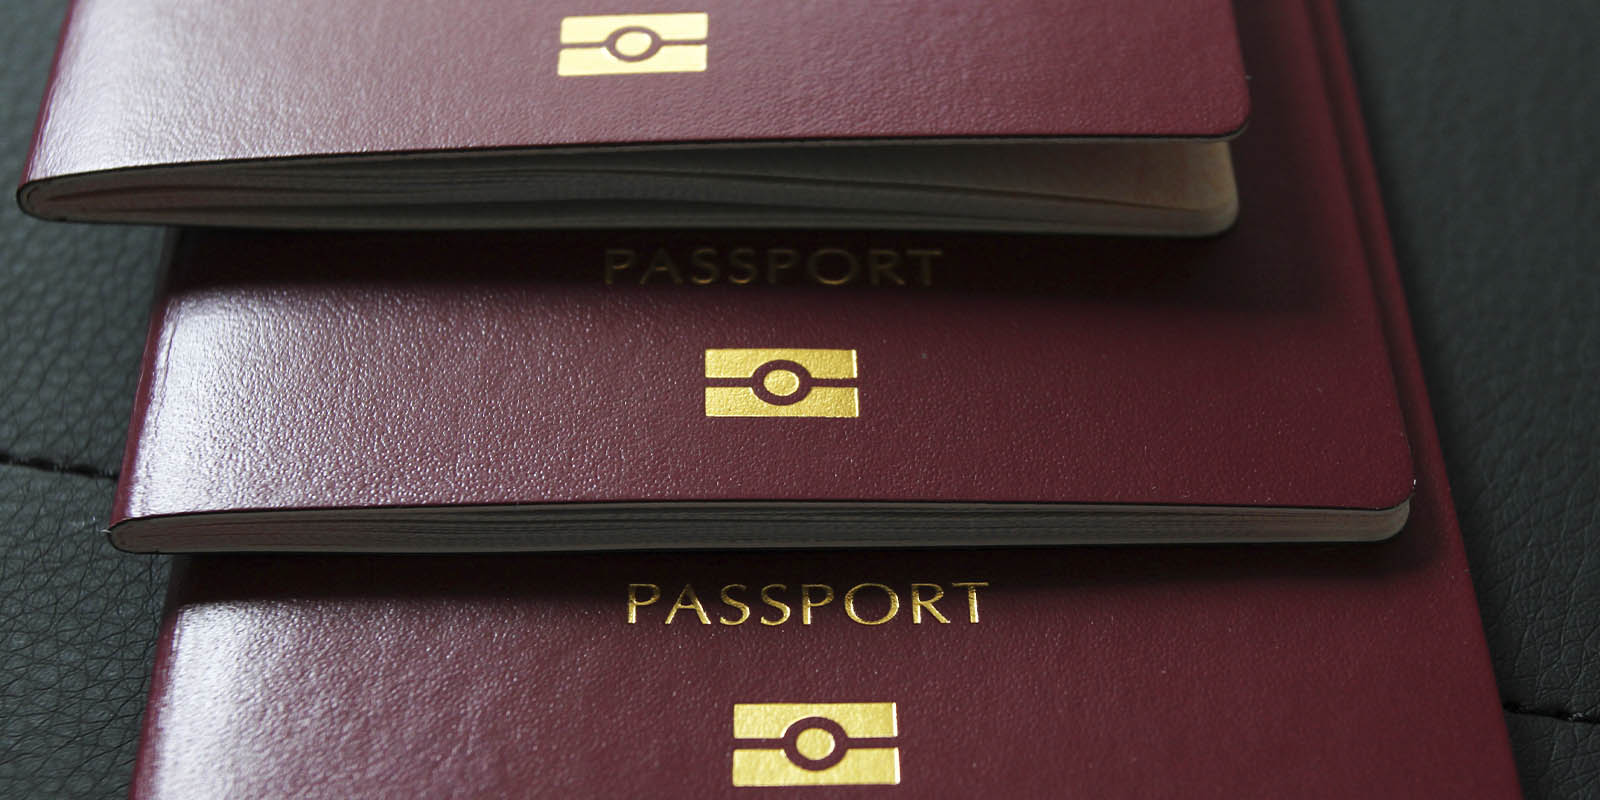 MENA entrepreneurs are investing in a second passport.